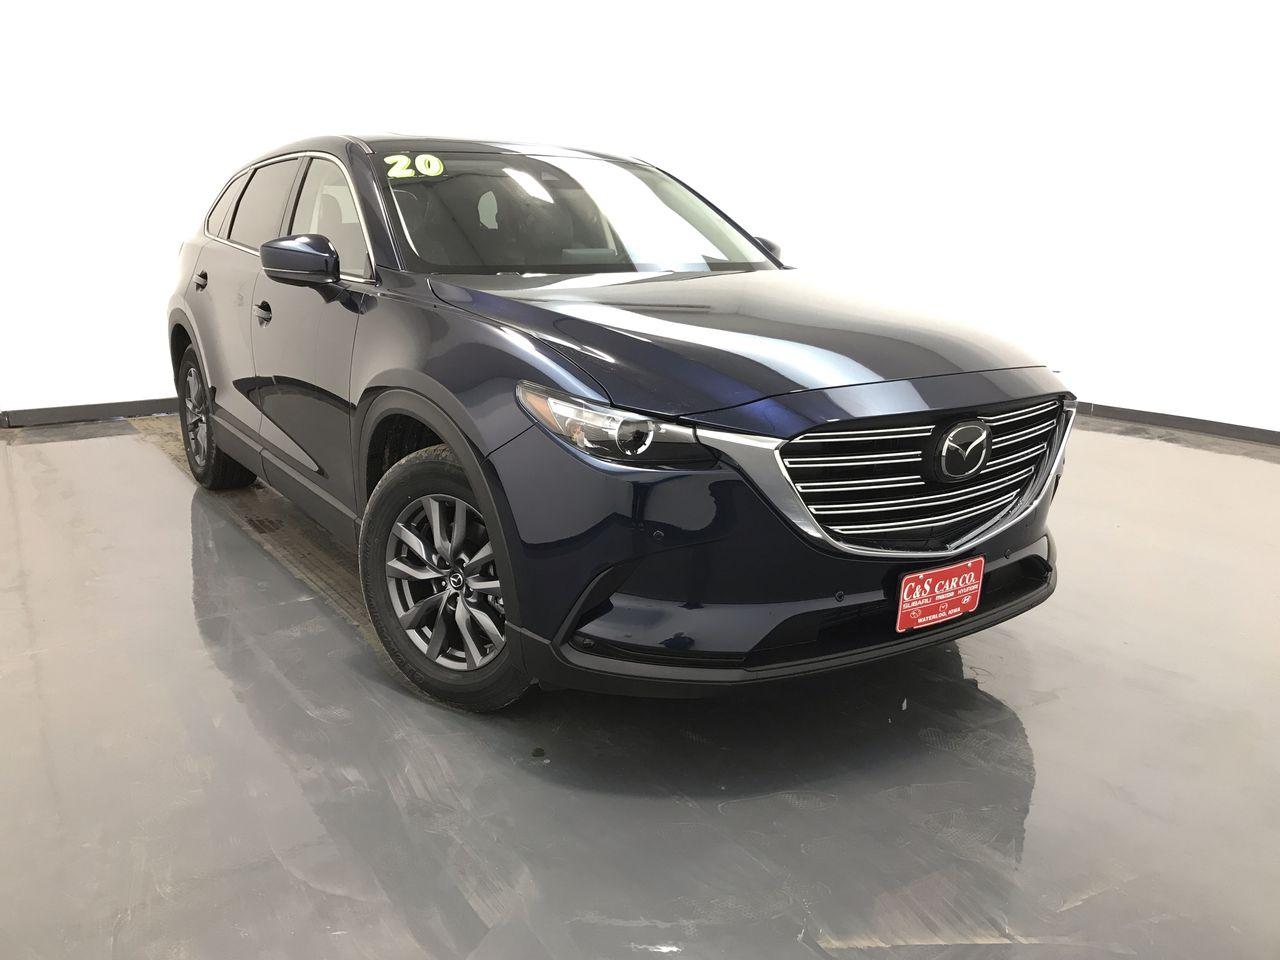 2020 Mazda CX-9 Touring AWD  - MA3355  - C & S Car Company